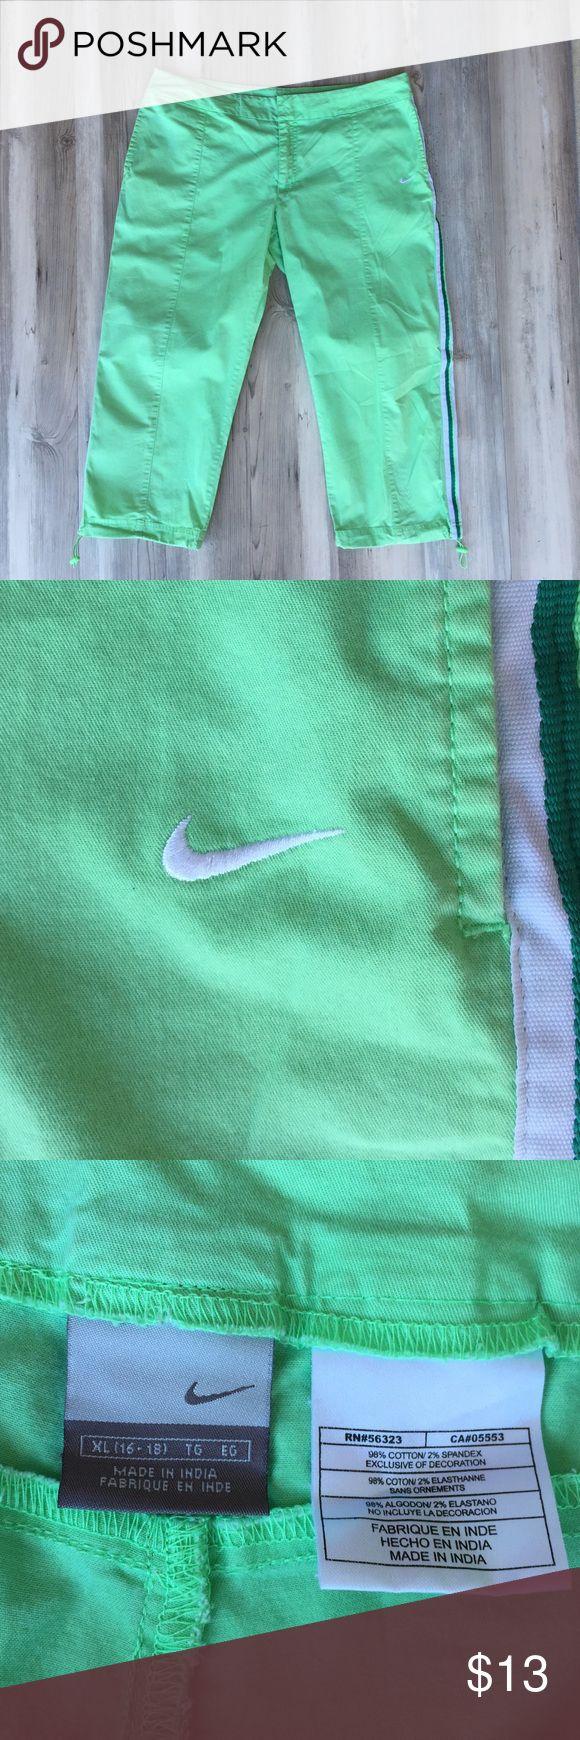 Nike Capri pants XL- green EUC Nike Capri pants with a dark green and white stripe down each pant leg!  Size is XL, see pics for measurements! Nike Pants Capris